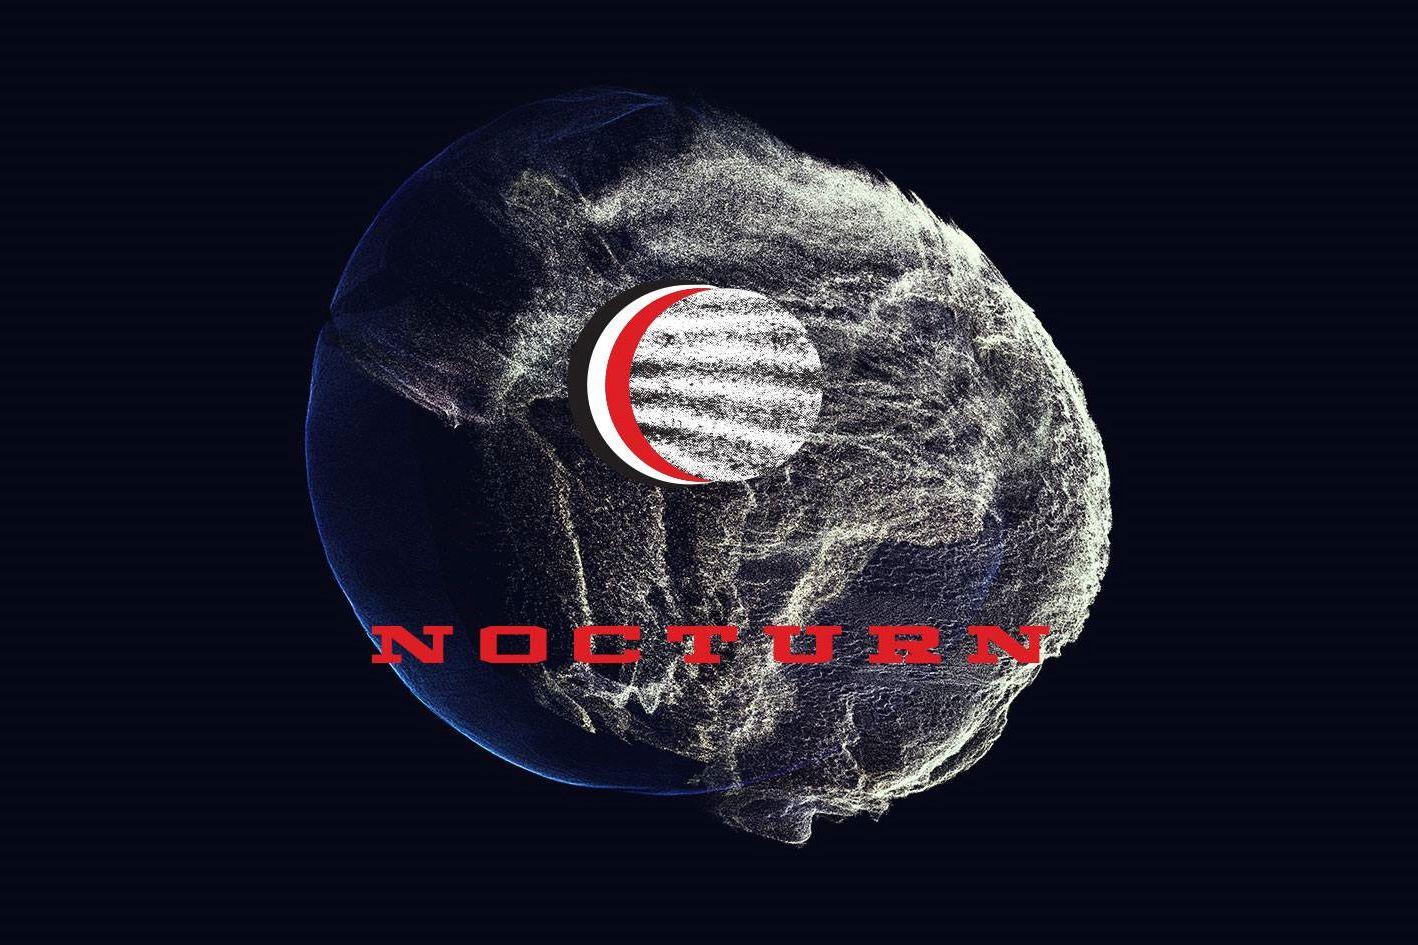 Nocturn - Carla's Dreams